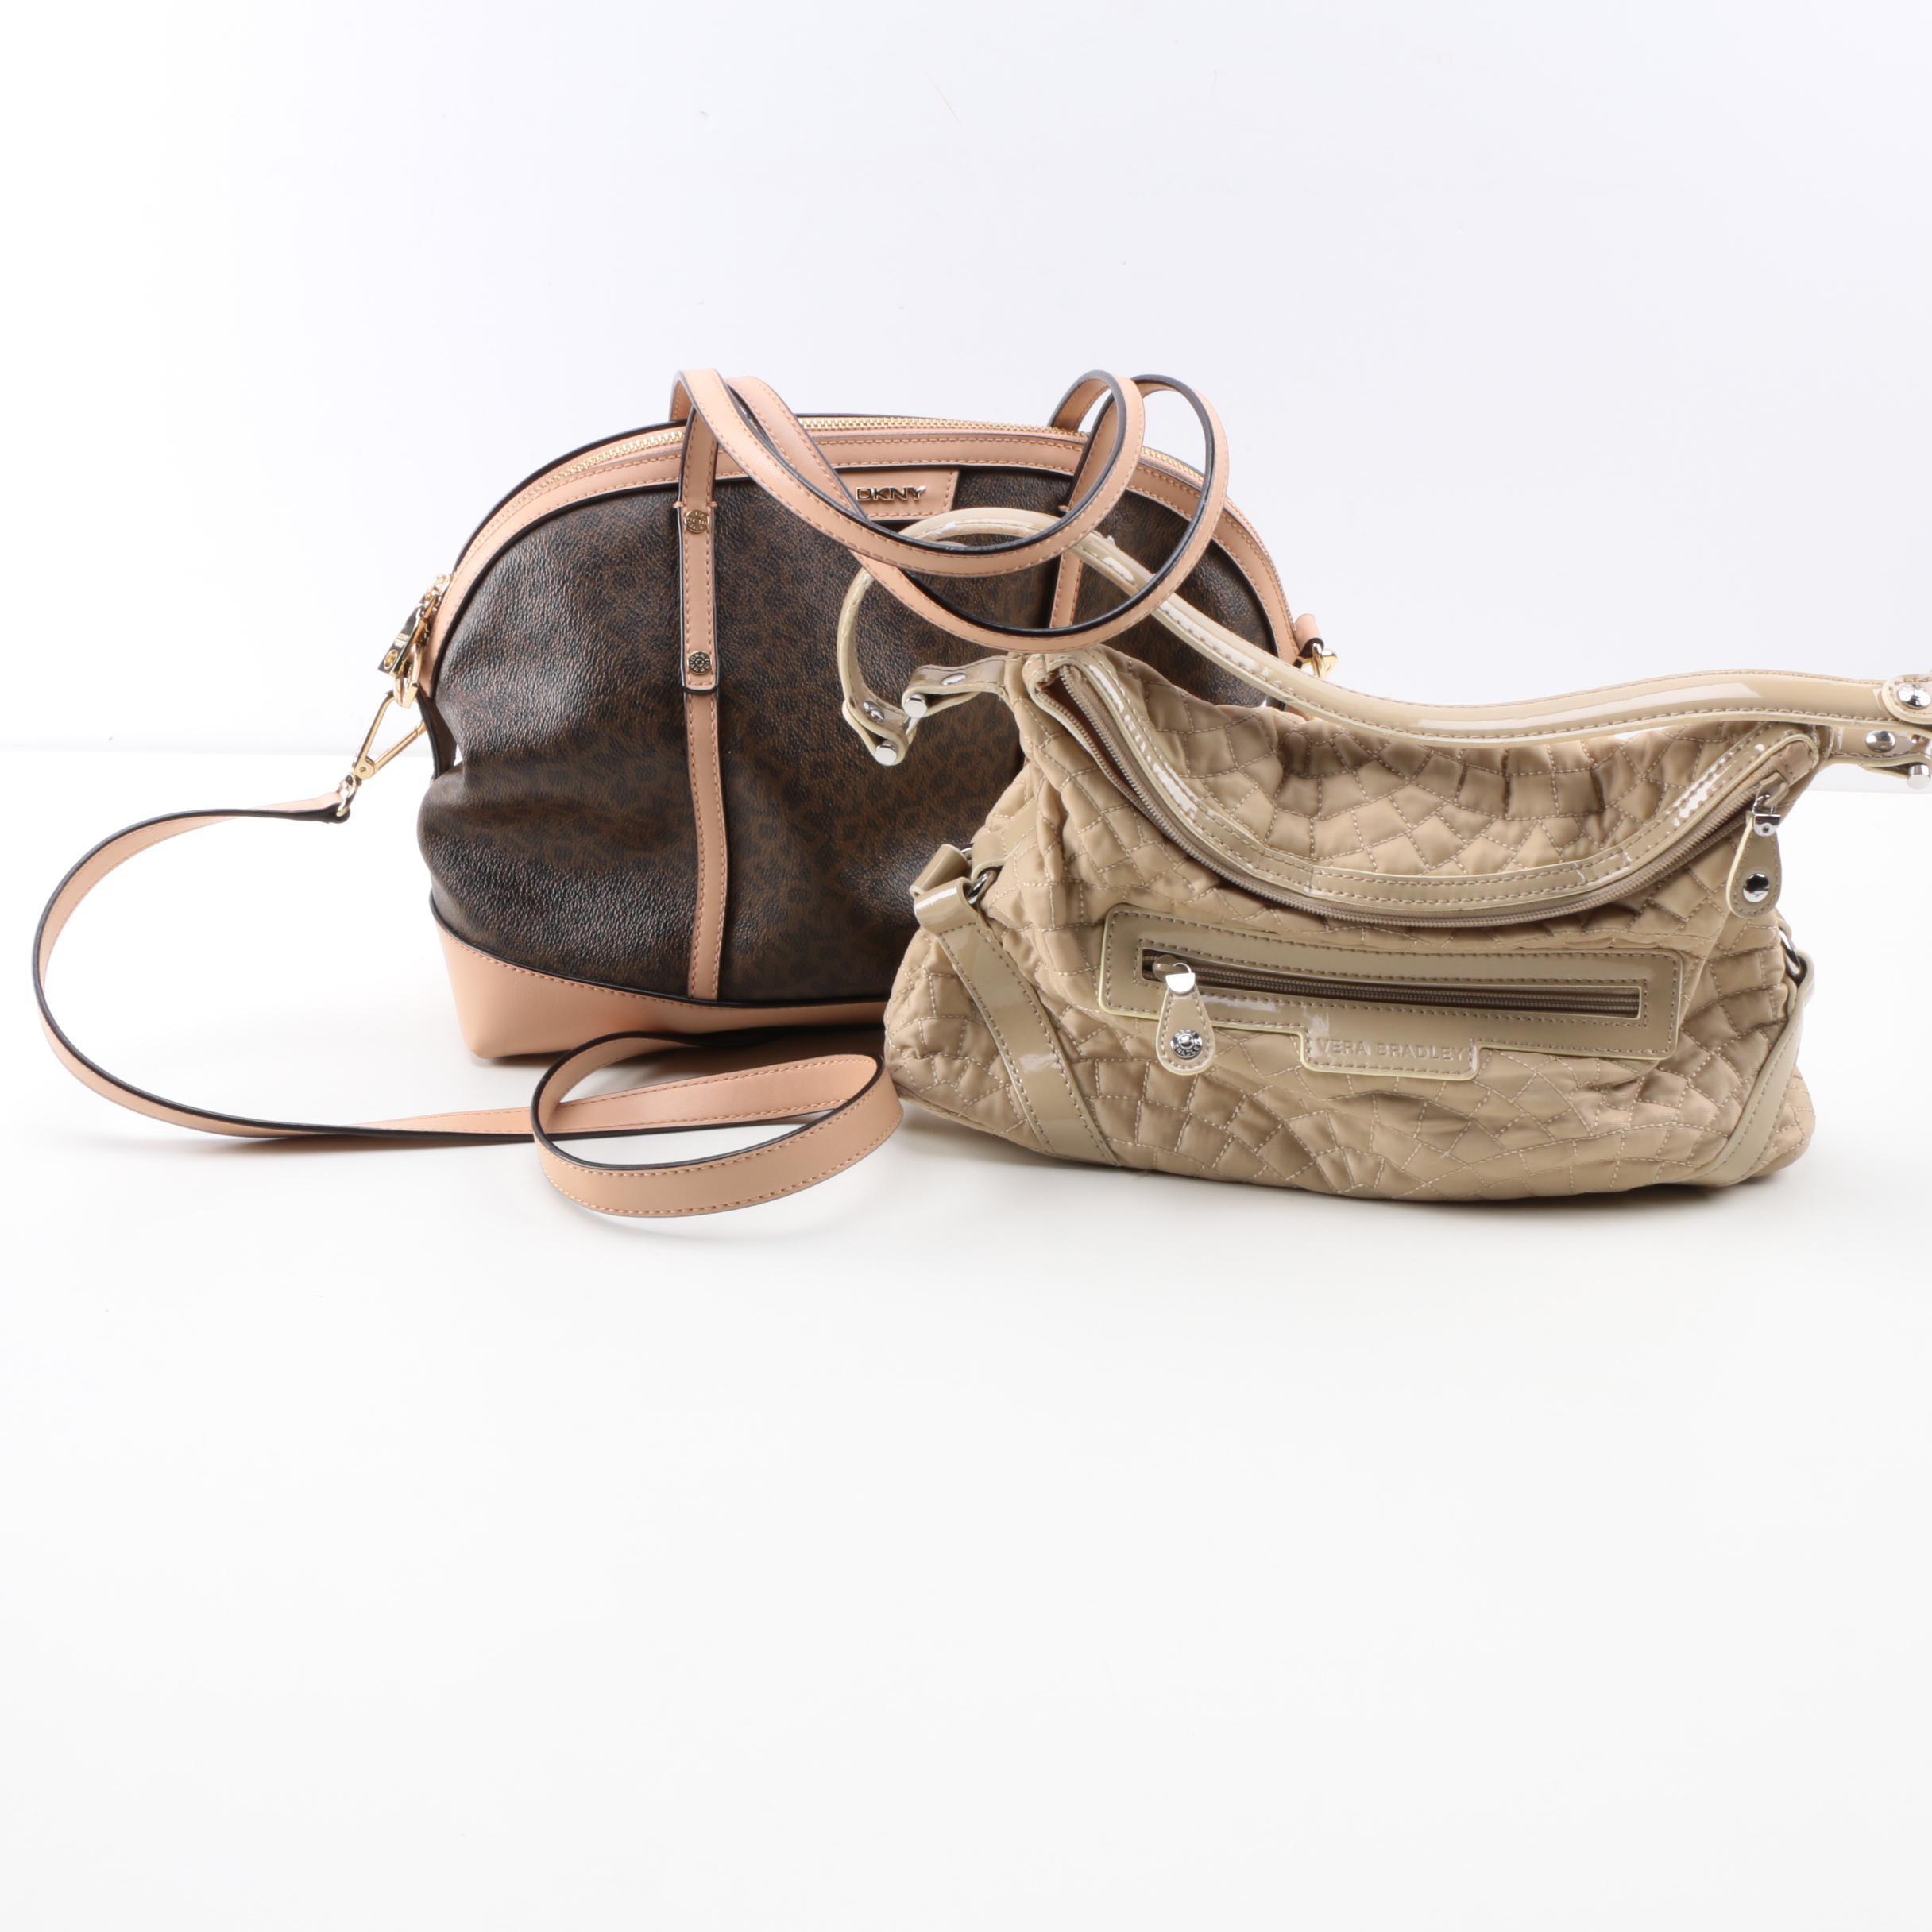 DKNY and Vera Bradley Handbags